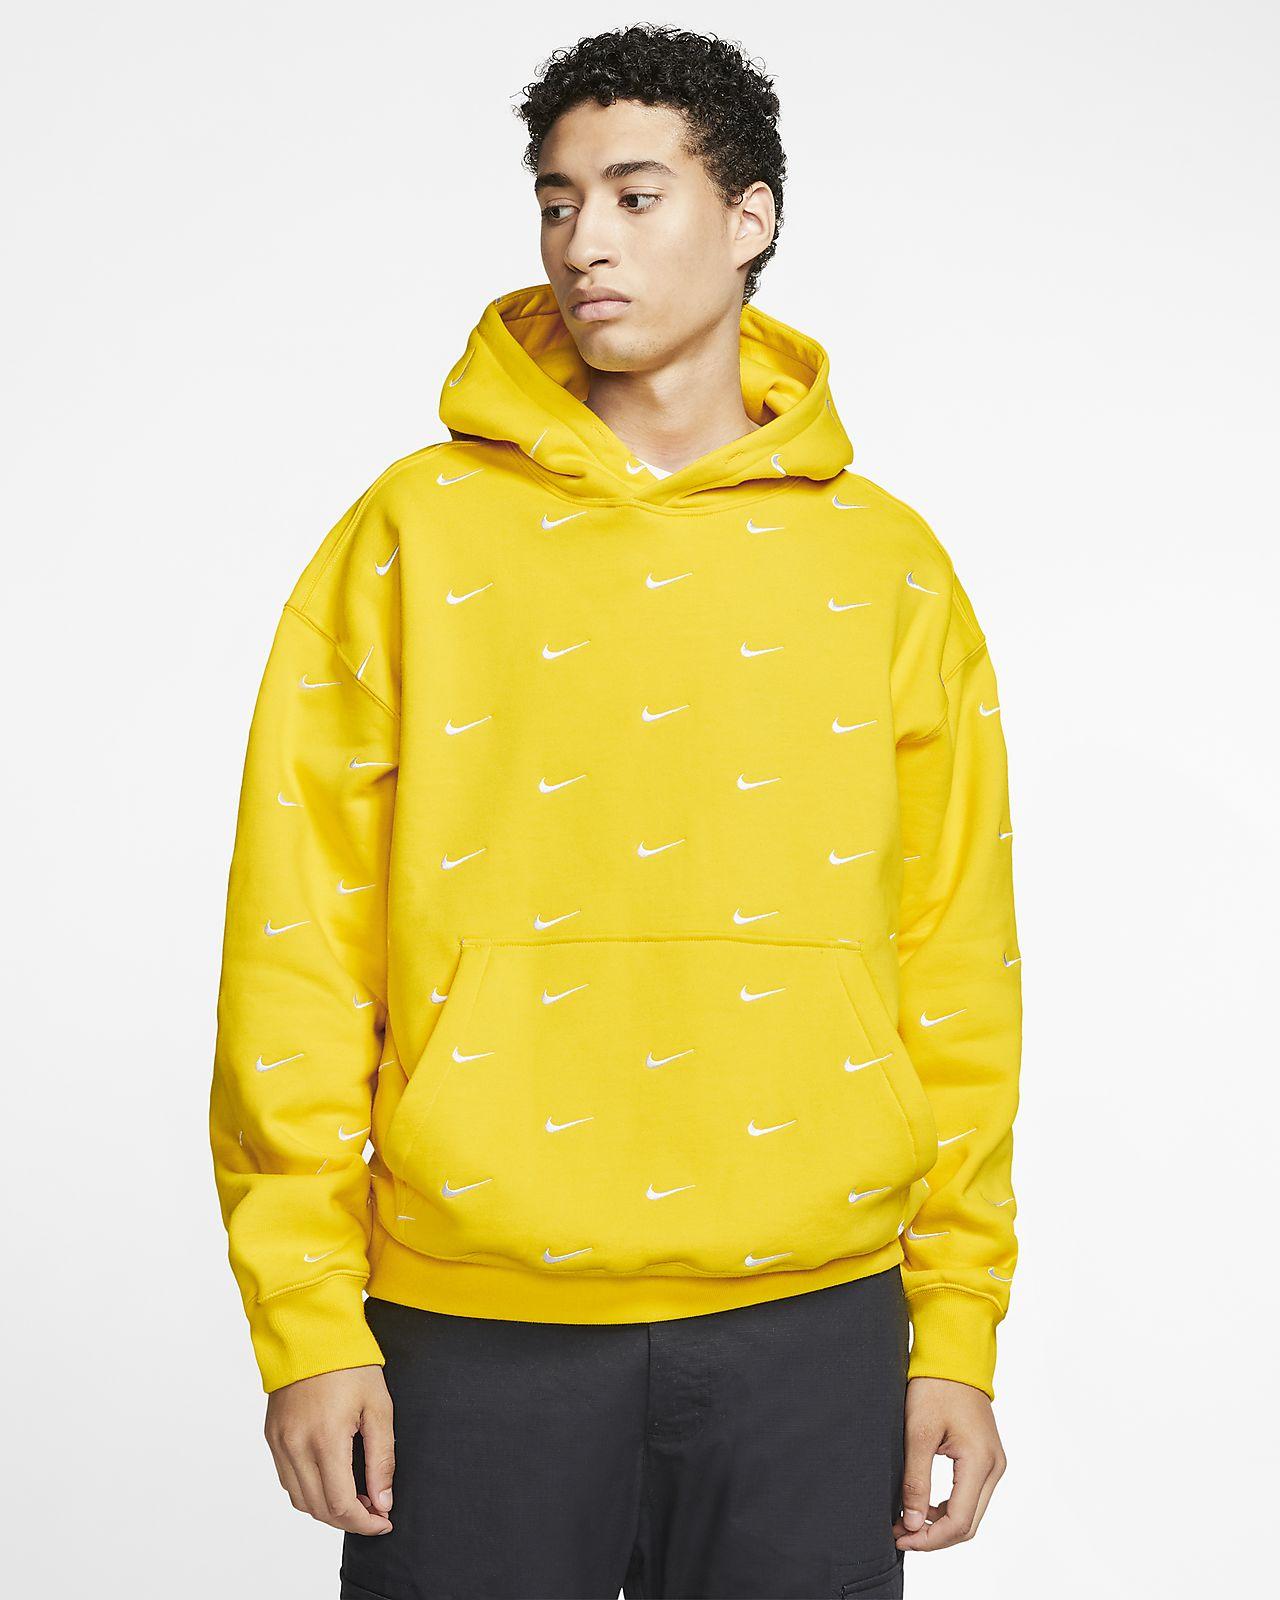 Hoodie com logótipo Swoosh Nike para homem